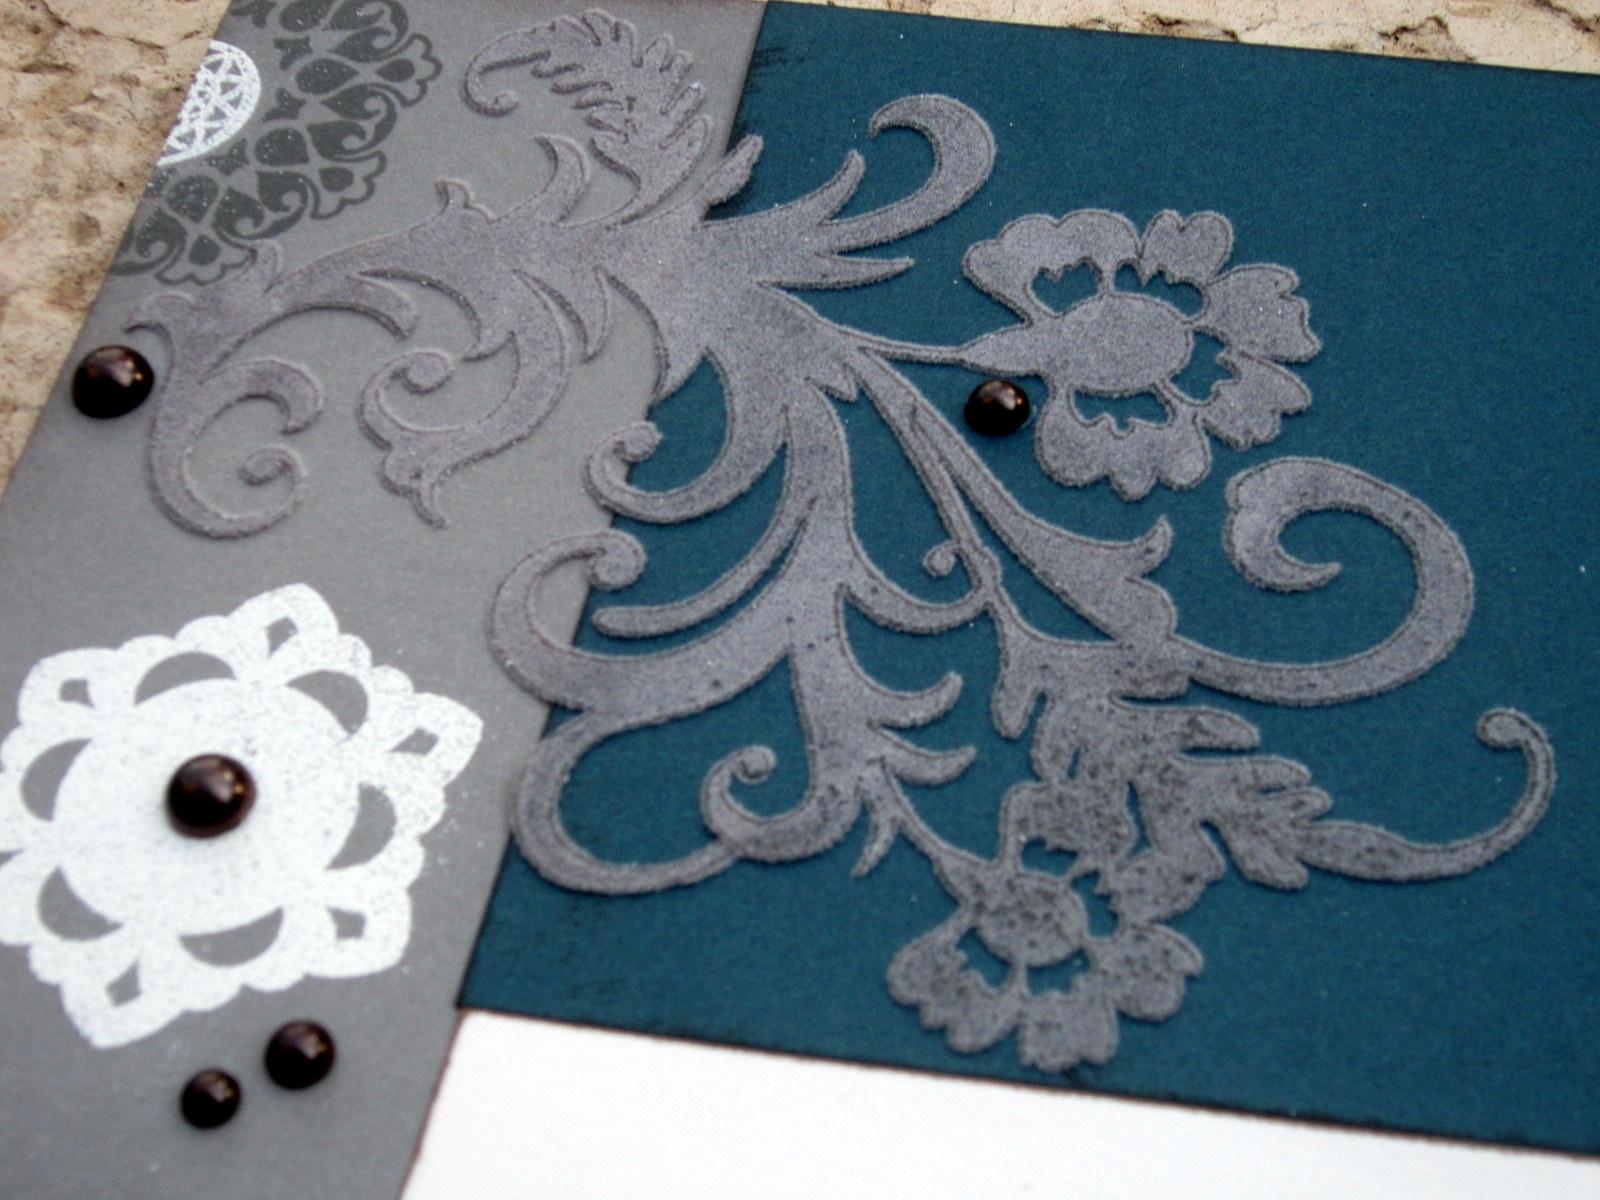 January scrapbook ideas - Items Needed Avonlea Workshop On The Go G1045 Avonlea Complements Canvas Shapres X7155c Antique Gold Mini Medley Accents Z1786